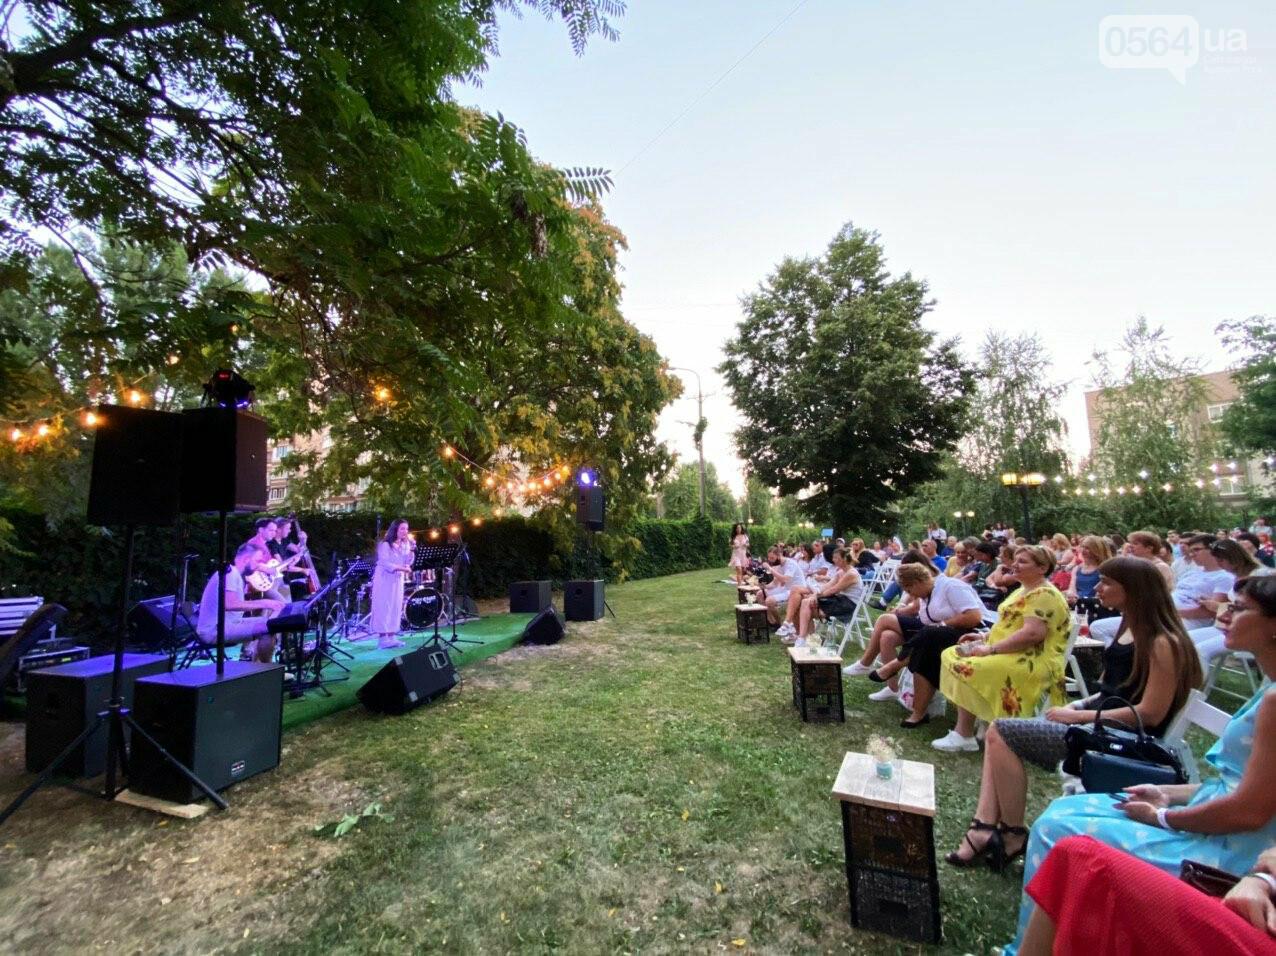 Под звездным небом криворожане наслаждались летним джазом от  Advantage Project, - ФОТО, ВИДЕО , фото-19